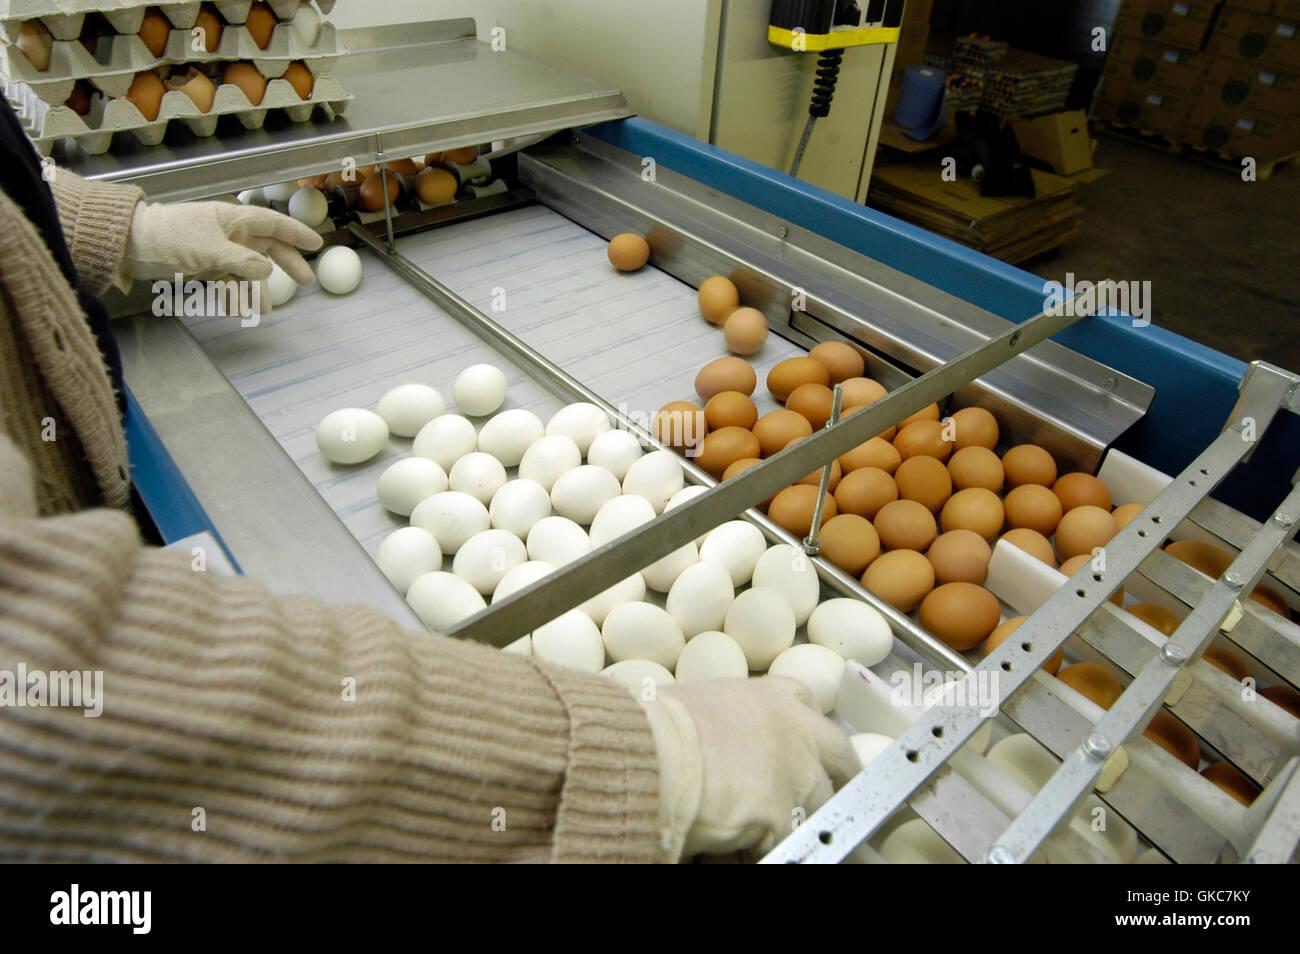 eier,nahrungsmittelindustrie,nahrungsmittel,ernahrung,ernaehrung,nahrung,essen,industrie,wirtschaft - Stock Image